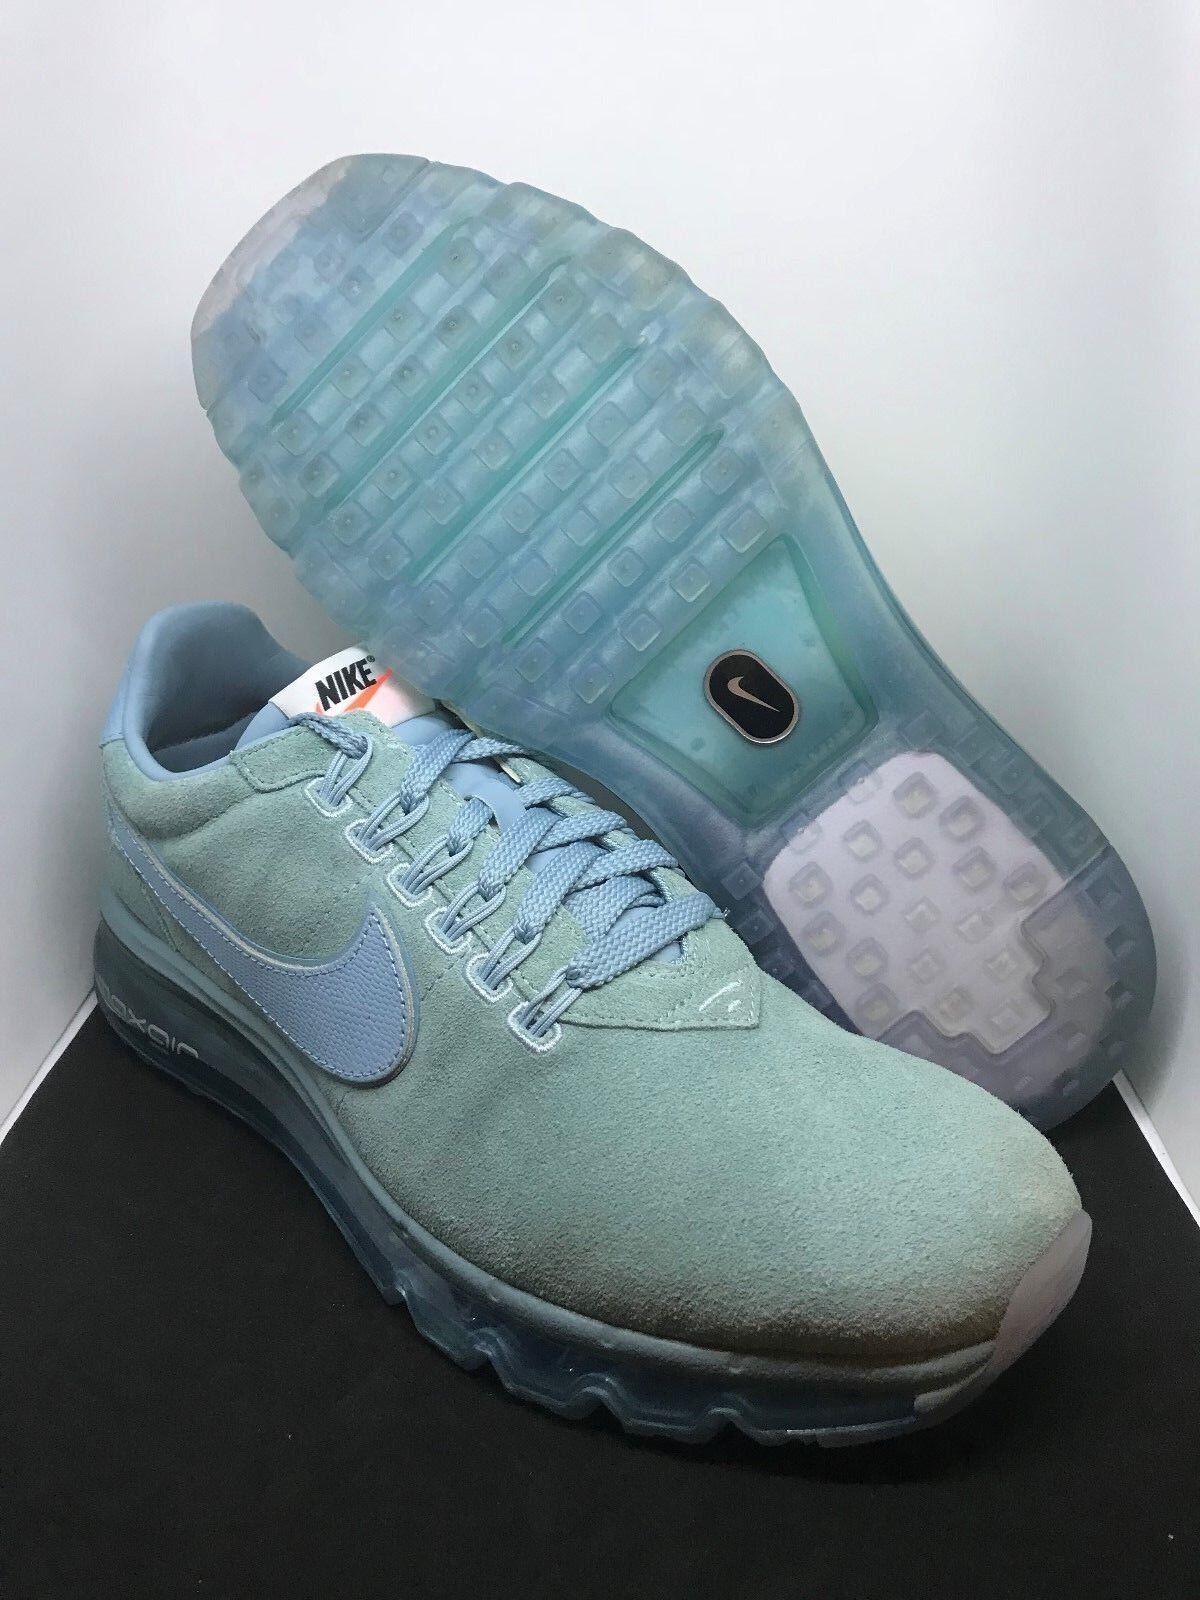 WMNS Nike Air Max LD Zero iD